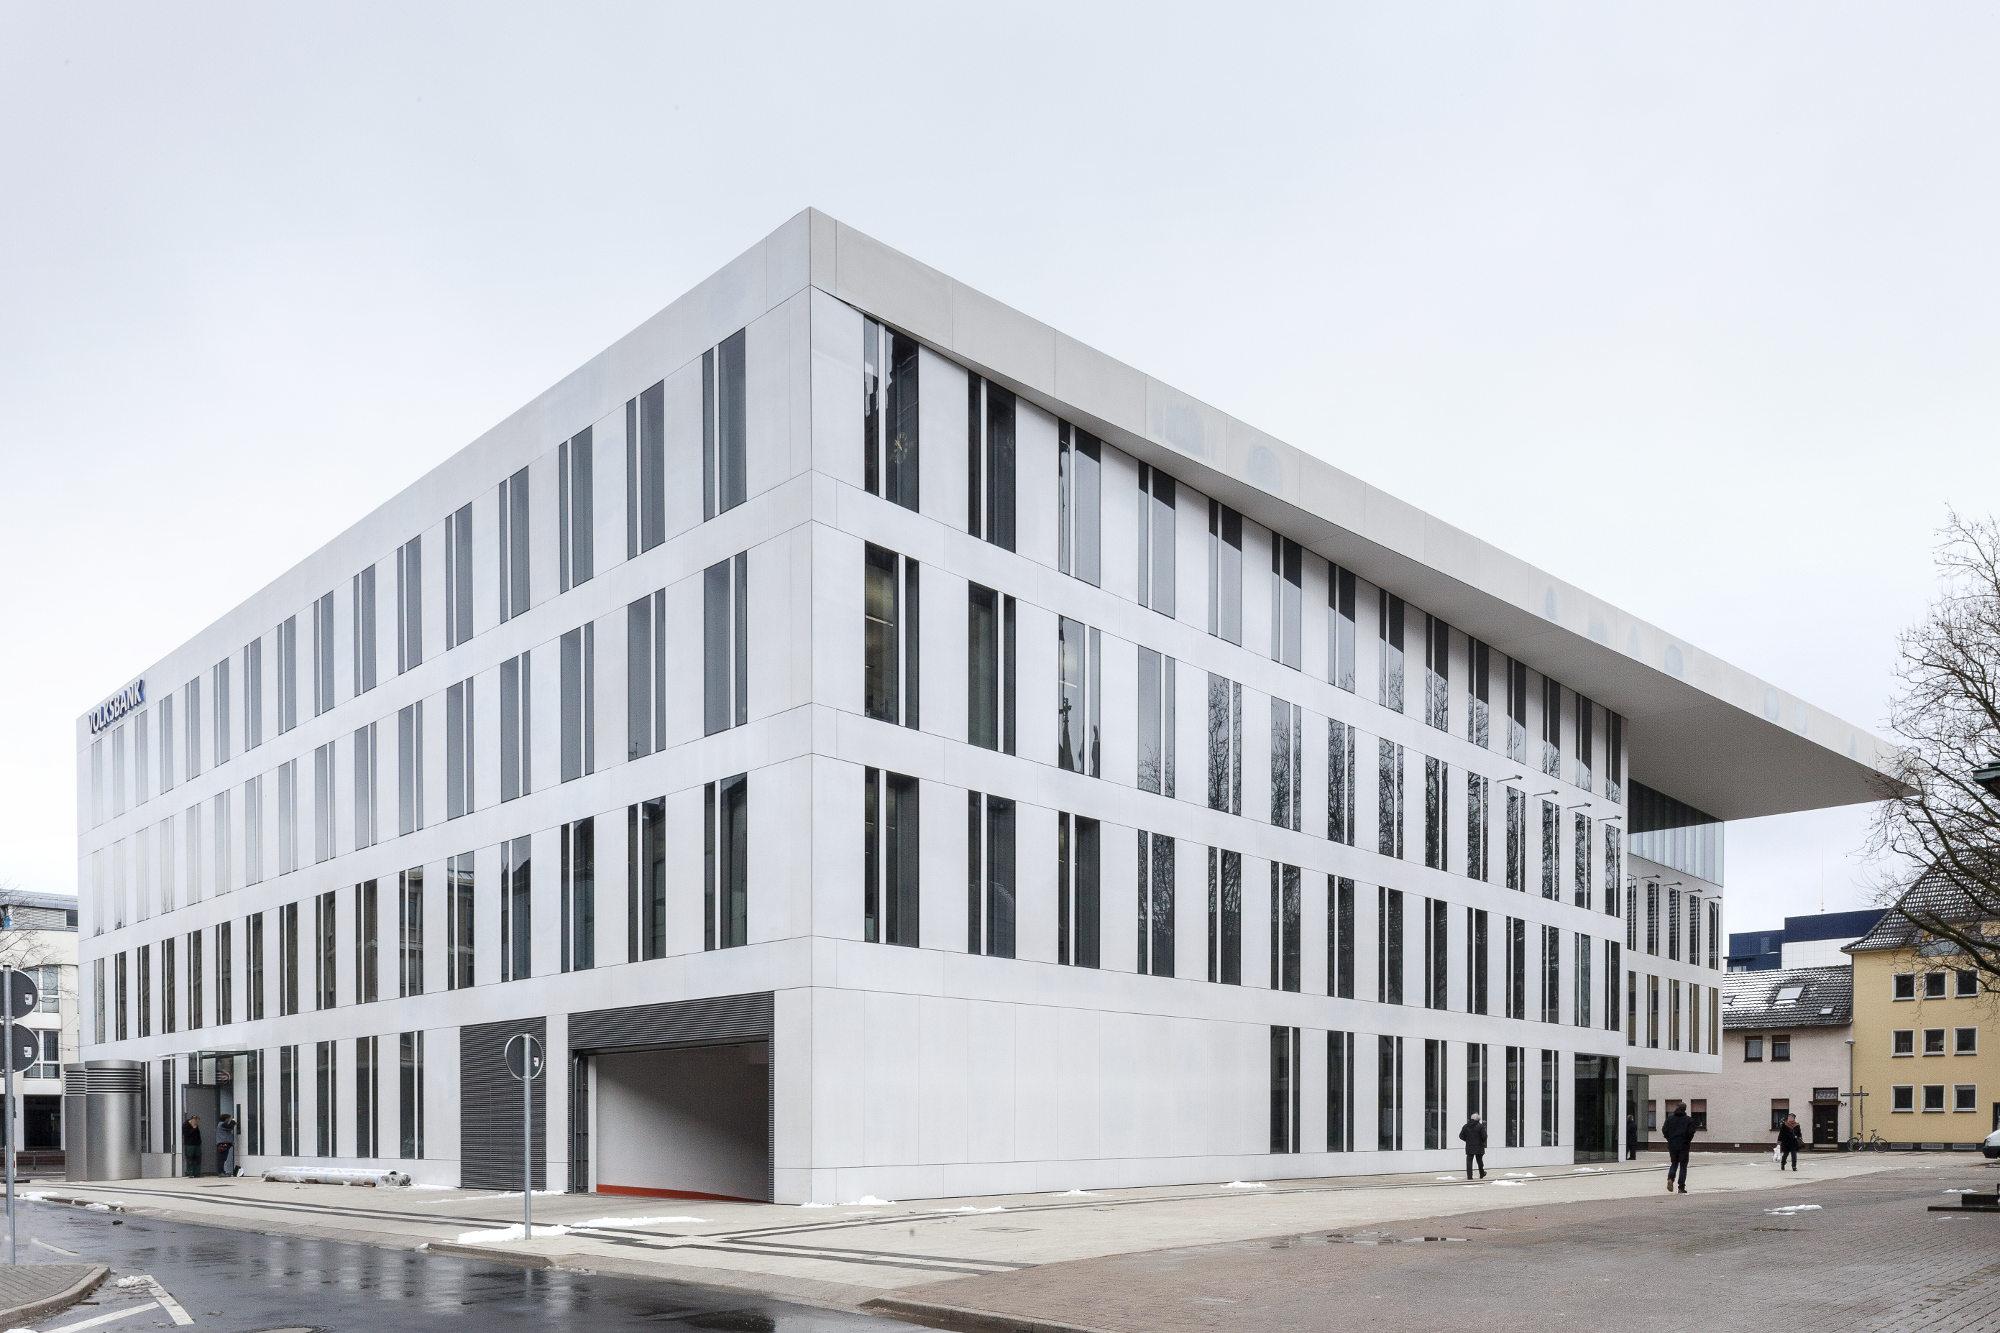 architekten krefeld volksbank krefeld legno werkst tte f r. Black Bedroom Furniture Sets. Home Design Ideas